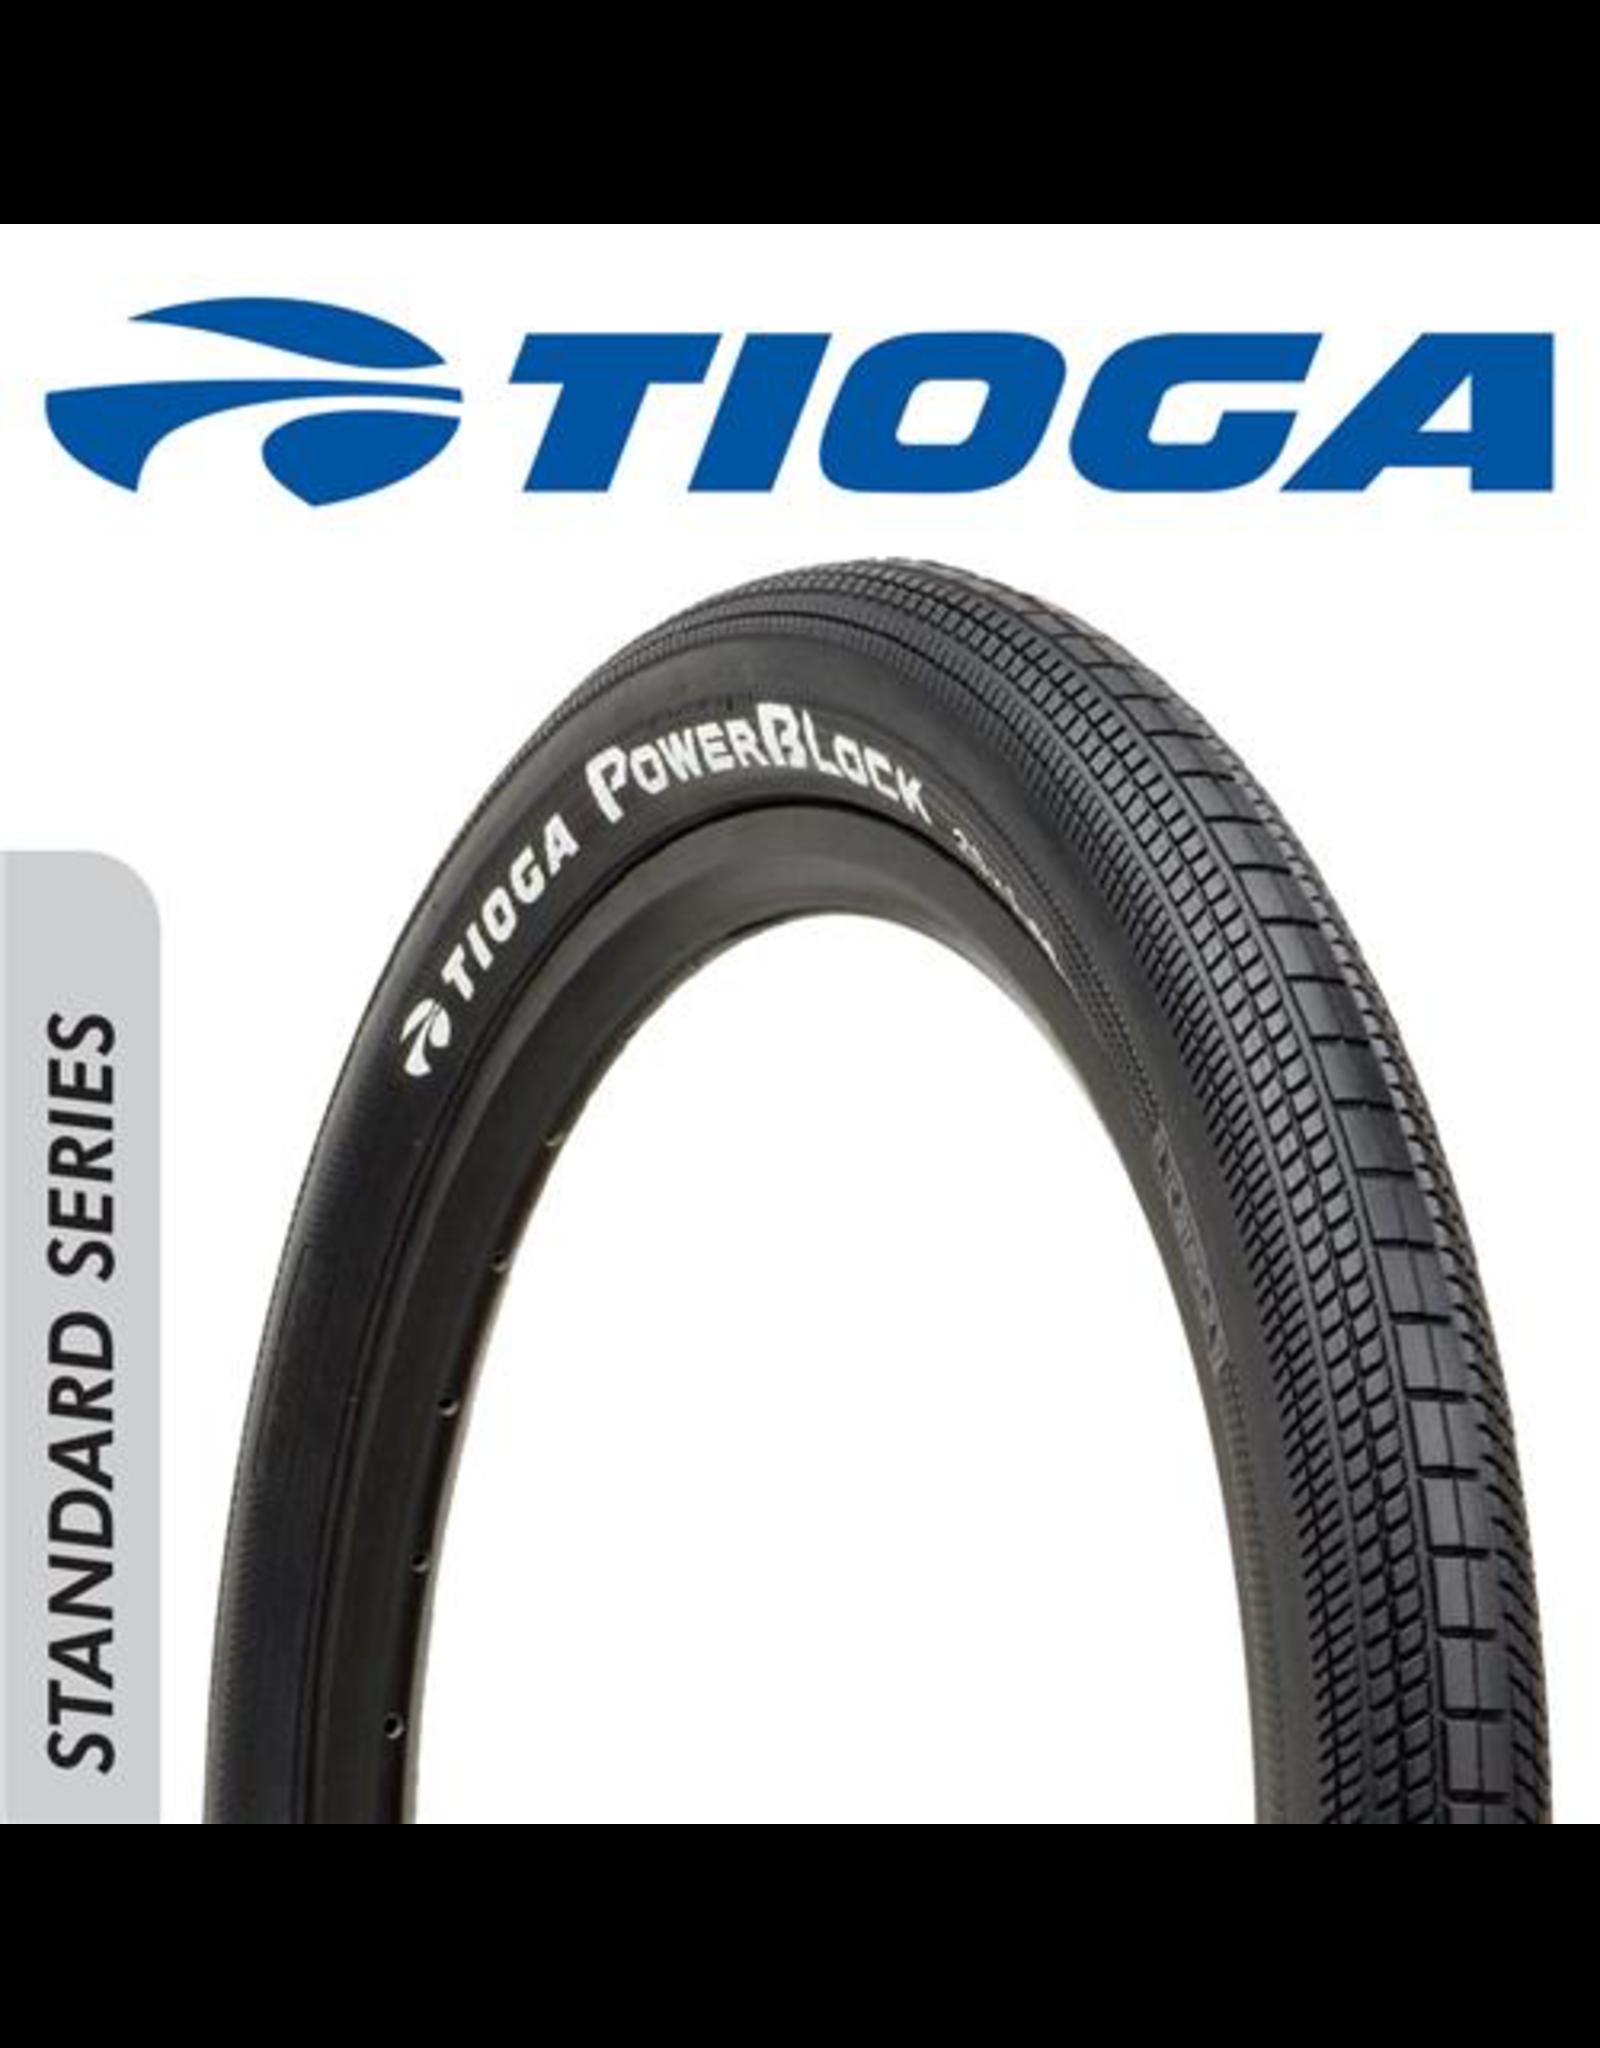 "TIOGA TIOGA POWERBLOCK 24 X 1.60"" TYRE"